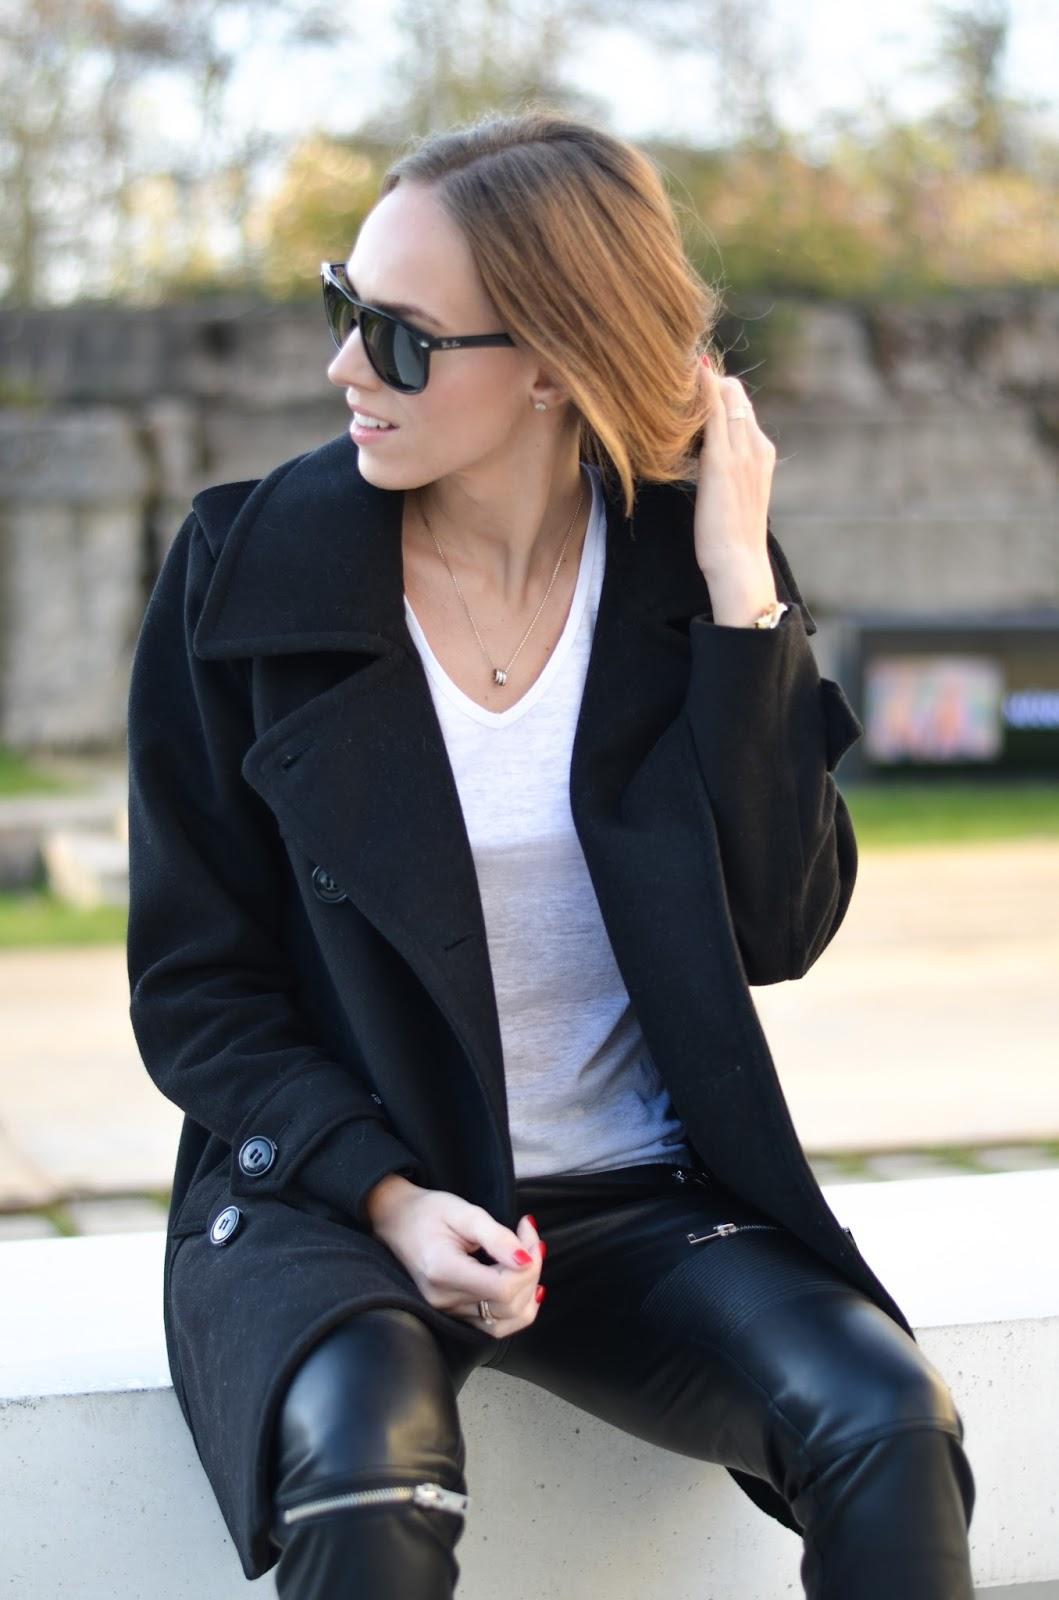 kristjaana mere minimal fashion white v neck tee peacoat leather pants